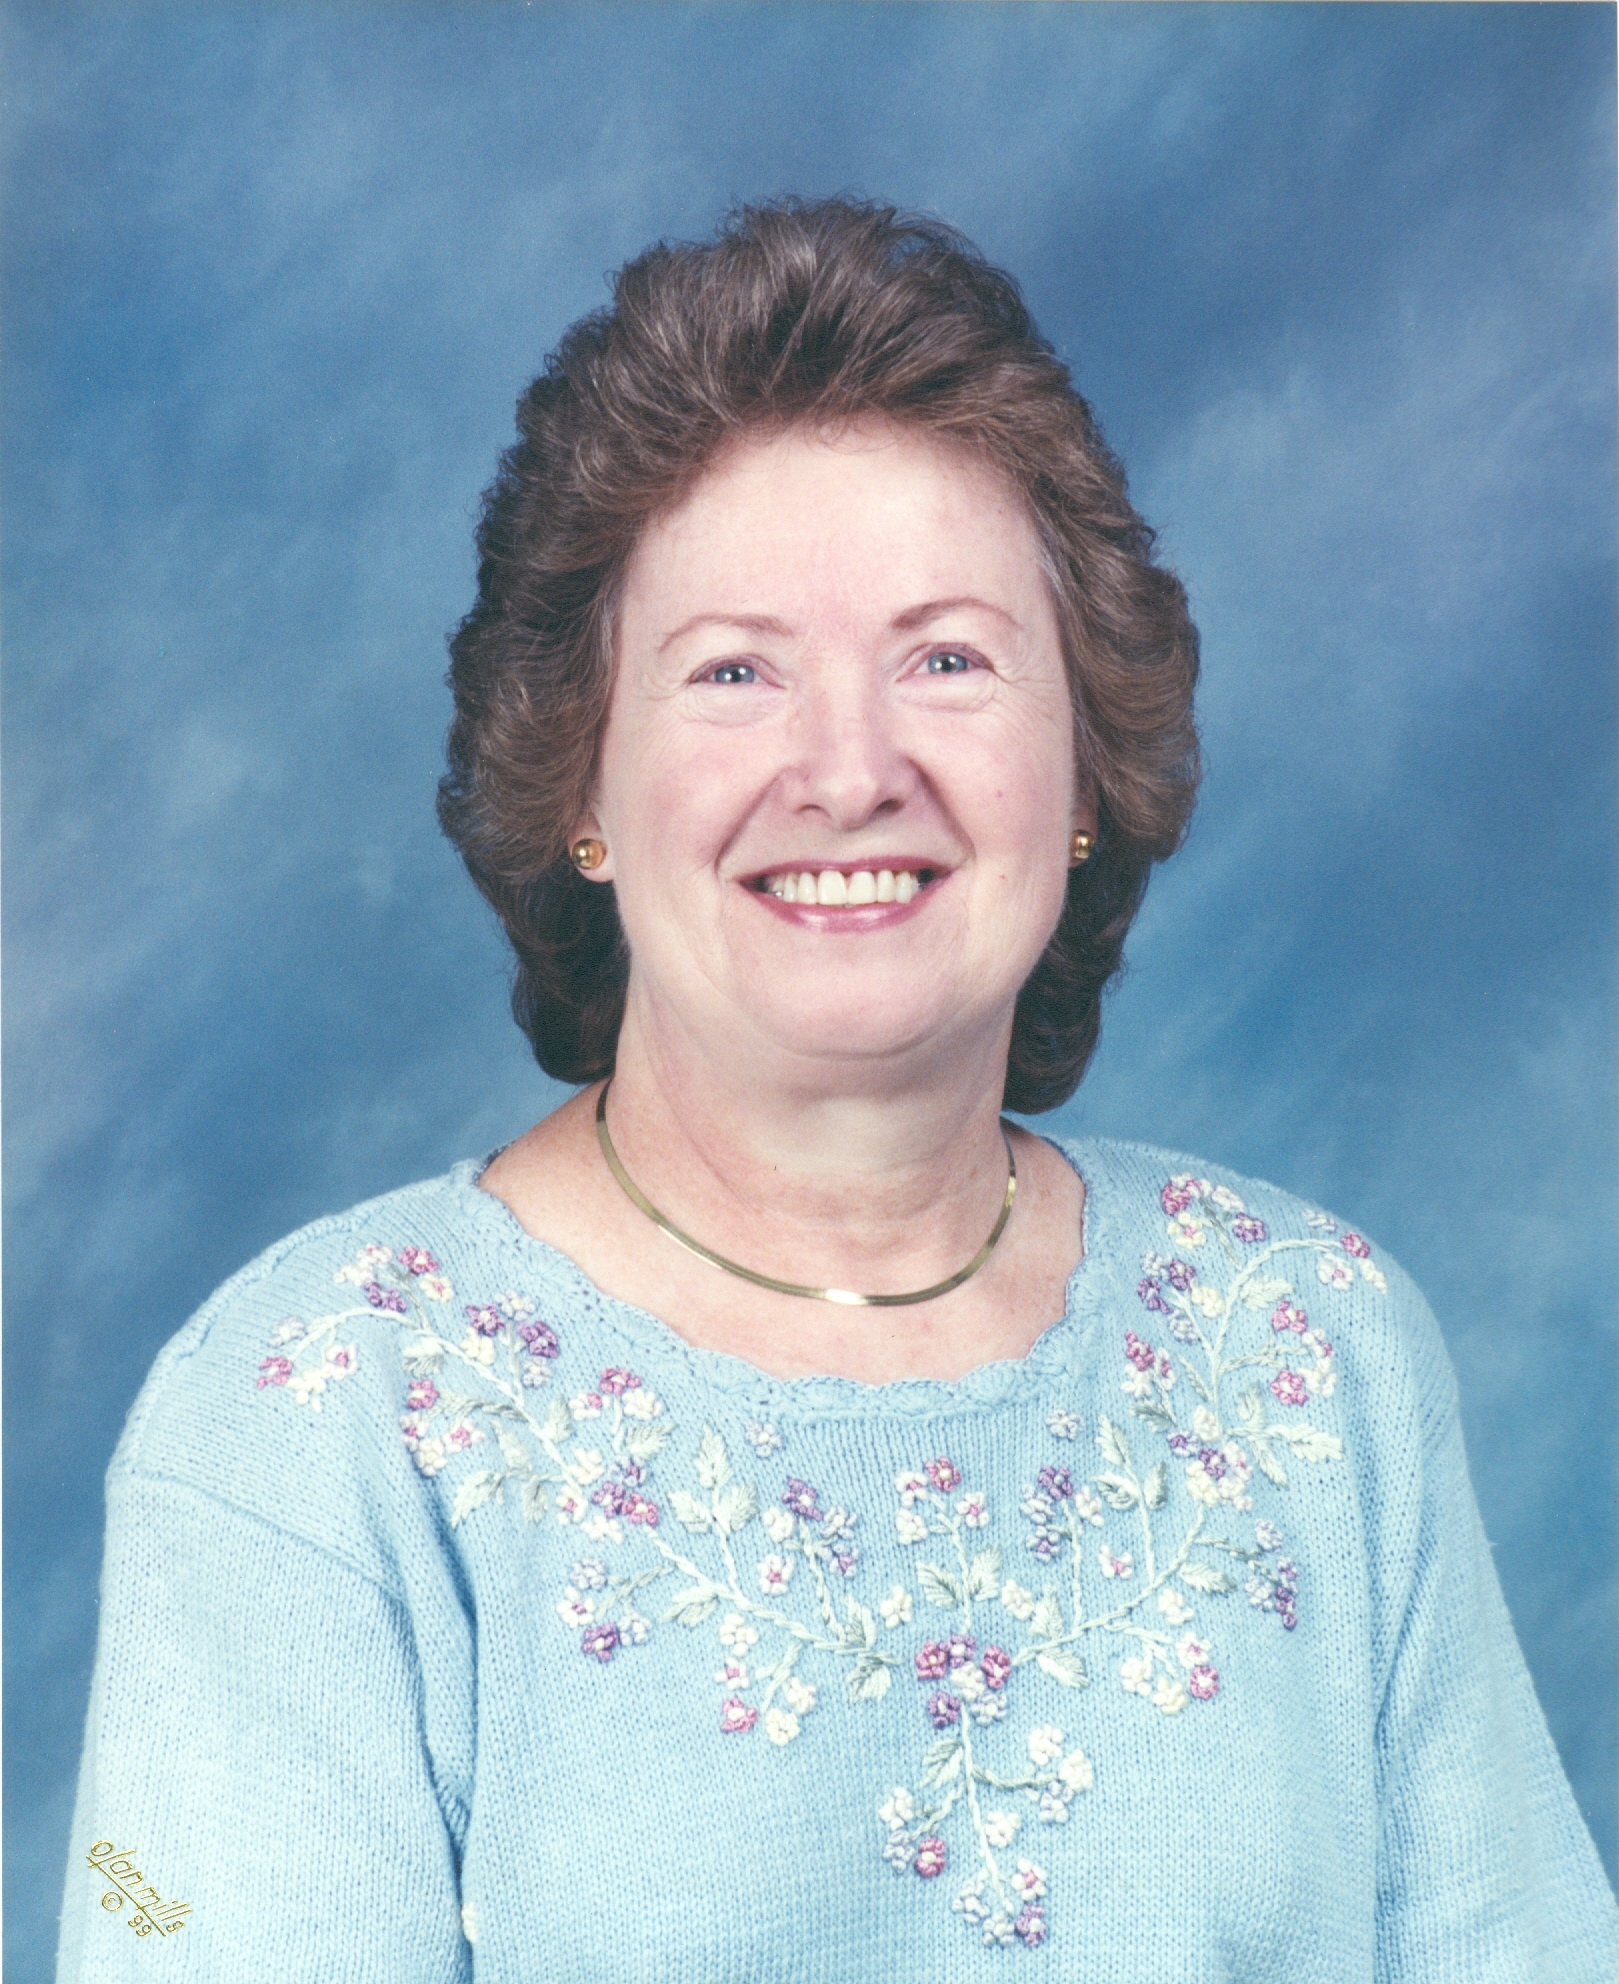 Marilyn Martin Nee Seeber Obituary Bellevue KY